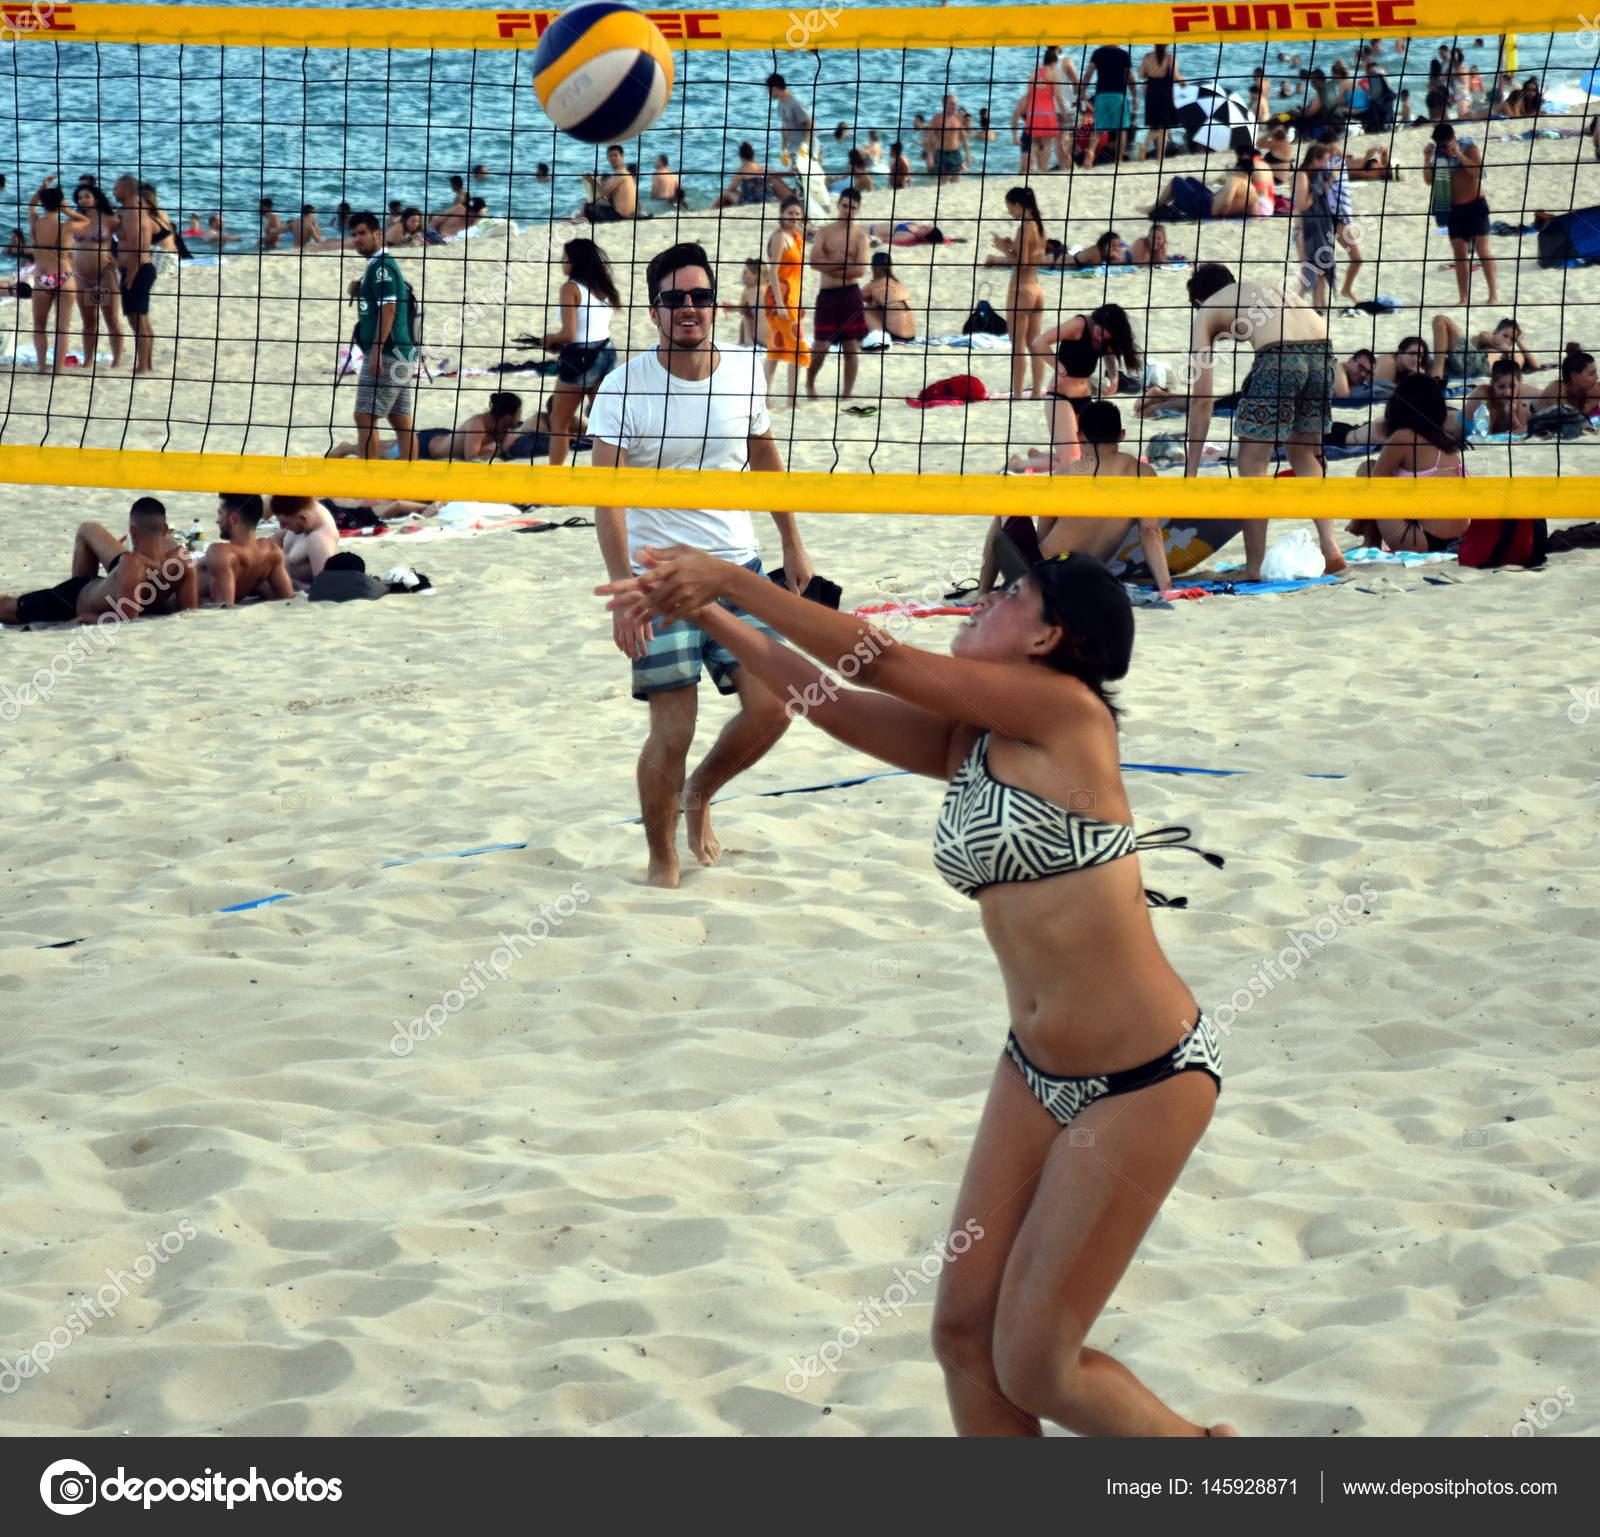 PlayeroChica En Voleibol Bikini Jugando FotosMujeres vf6y7Ybg